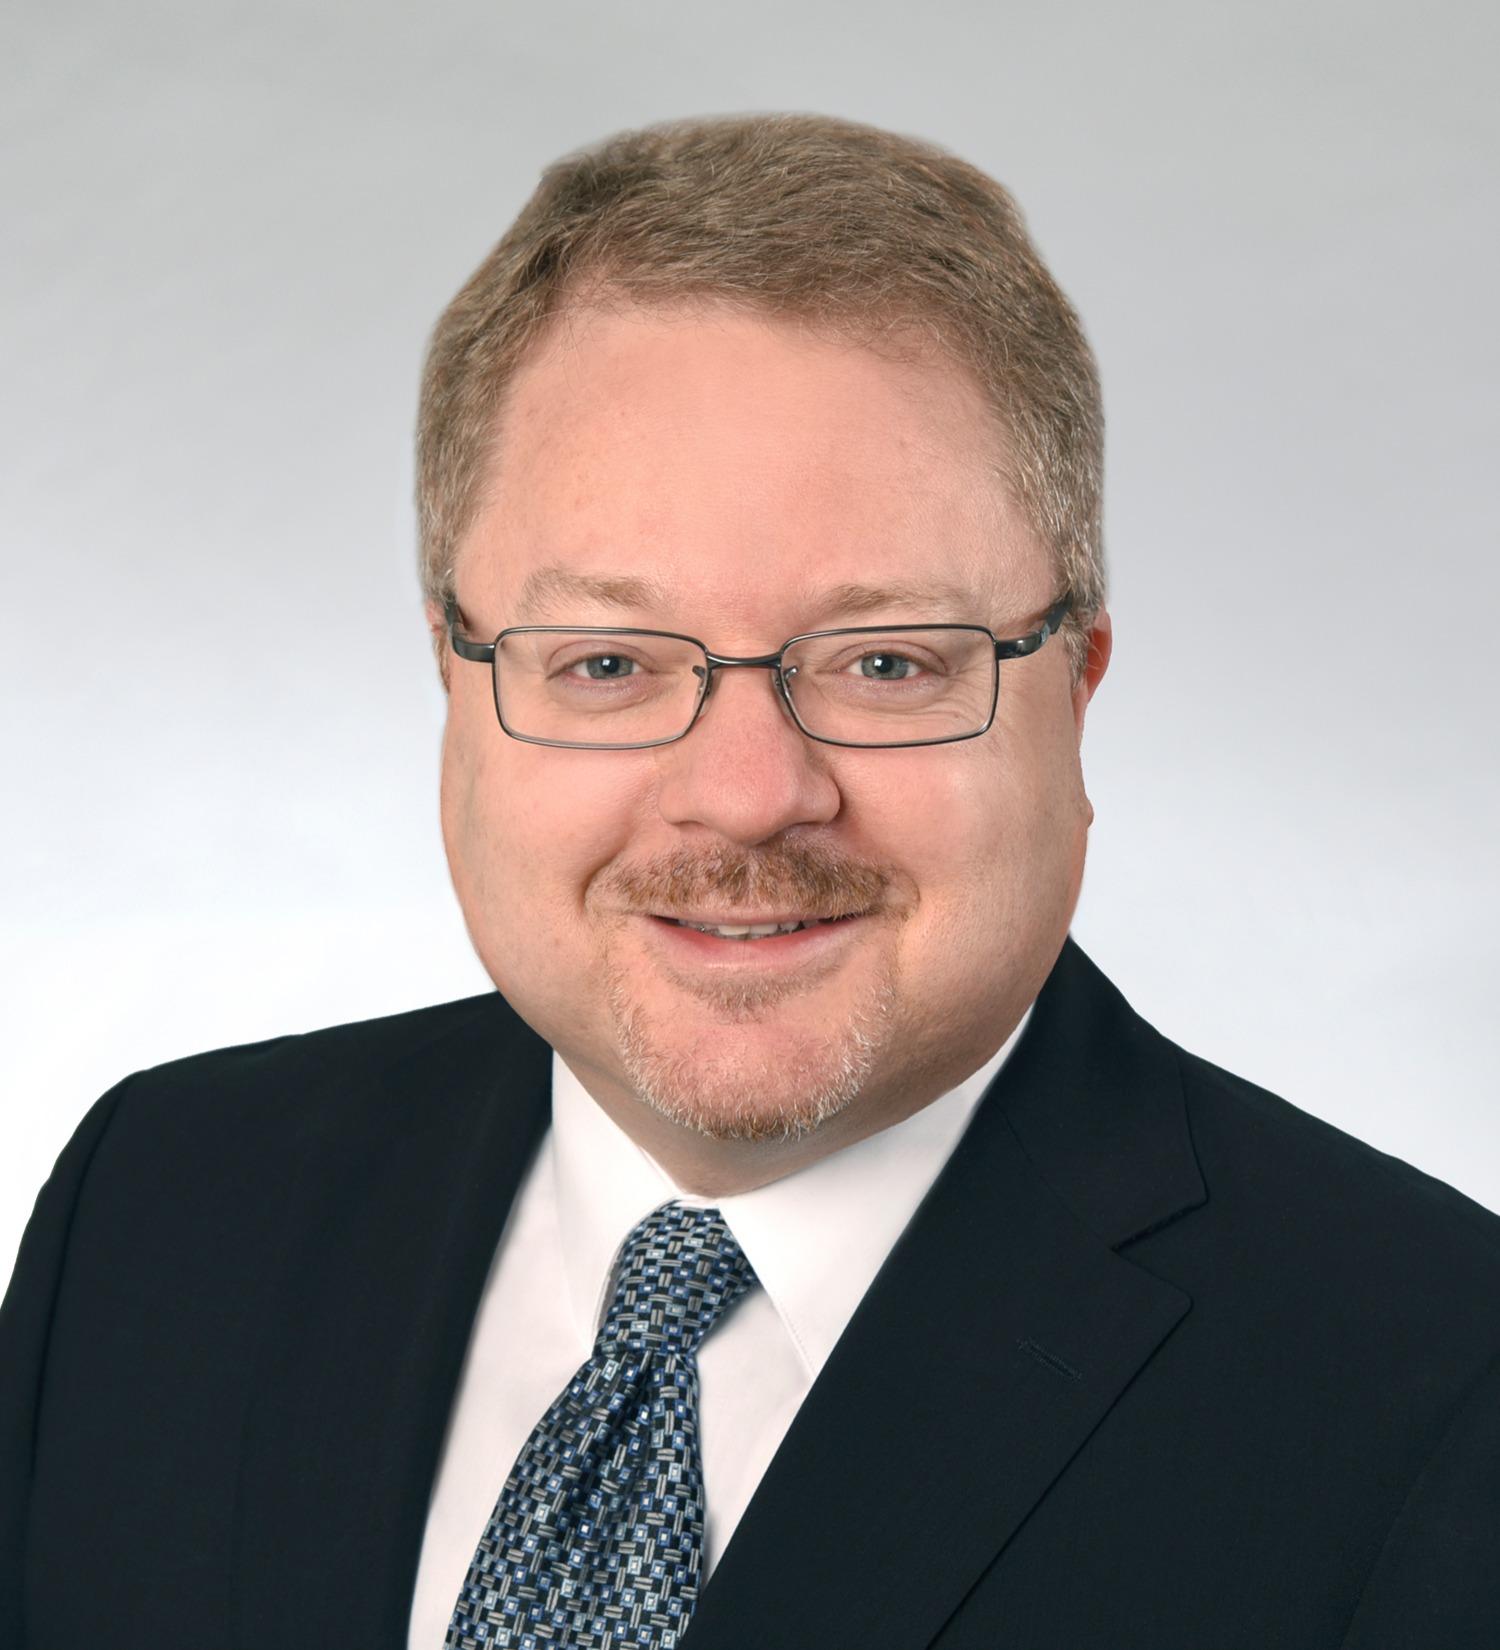 Uzzi O. Raanan's Profile Image